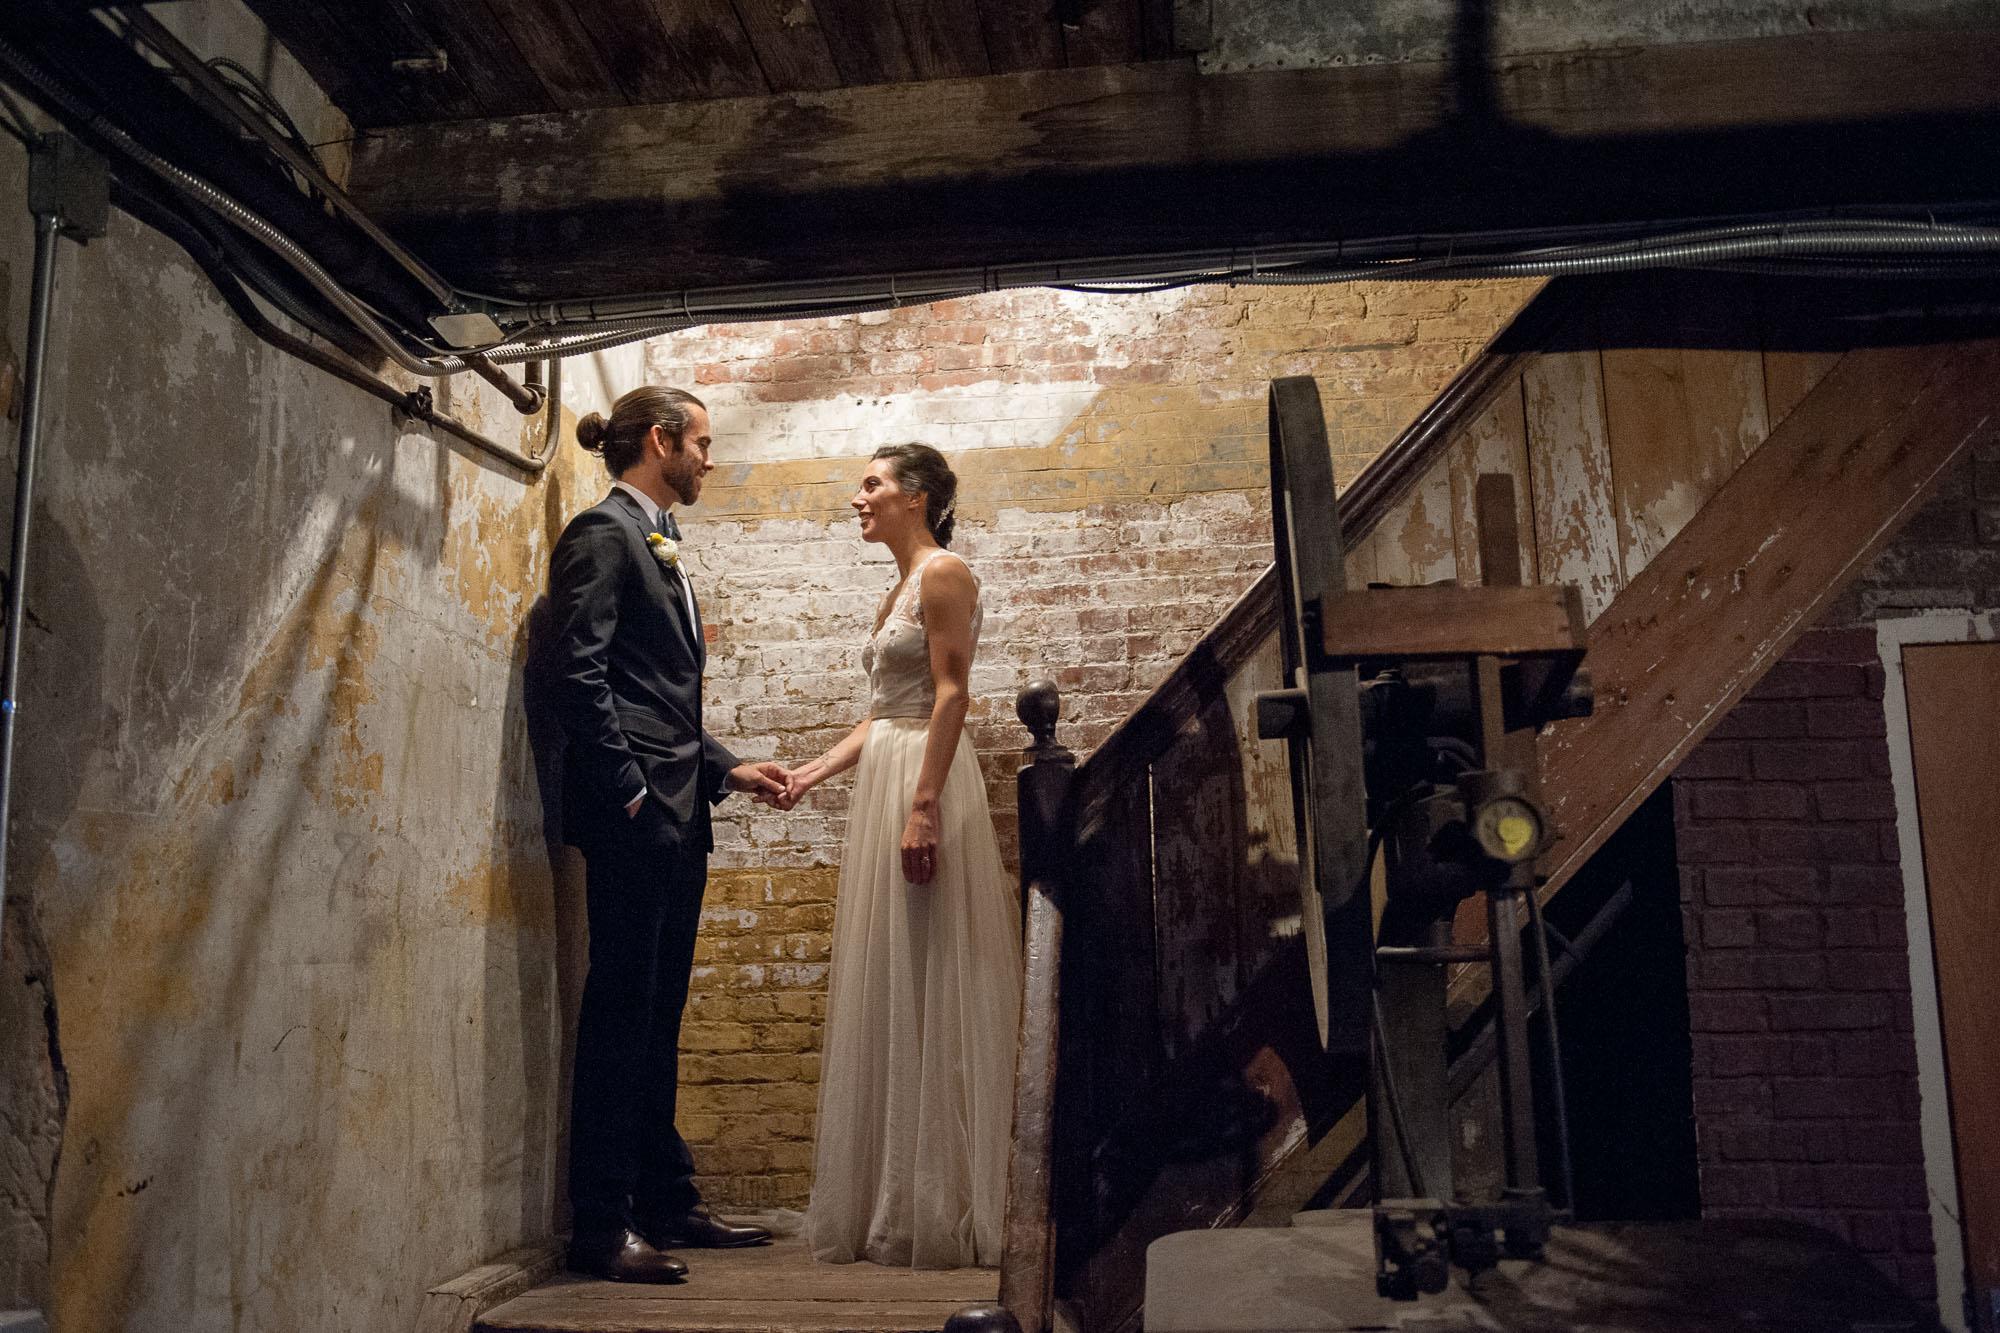 DSC_8667greenpoint-lofts-brooklyn-wedding-048.jpg